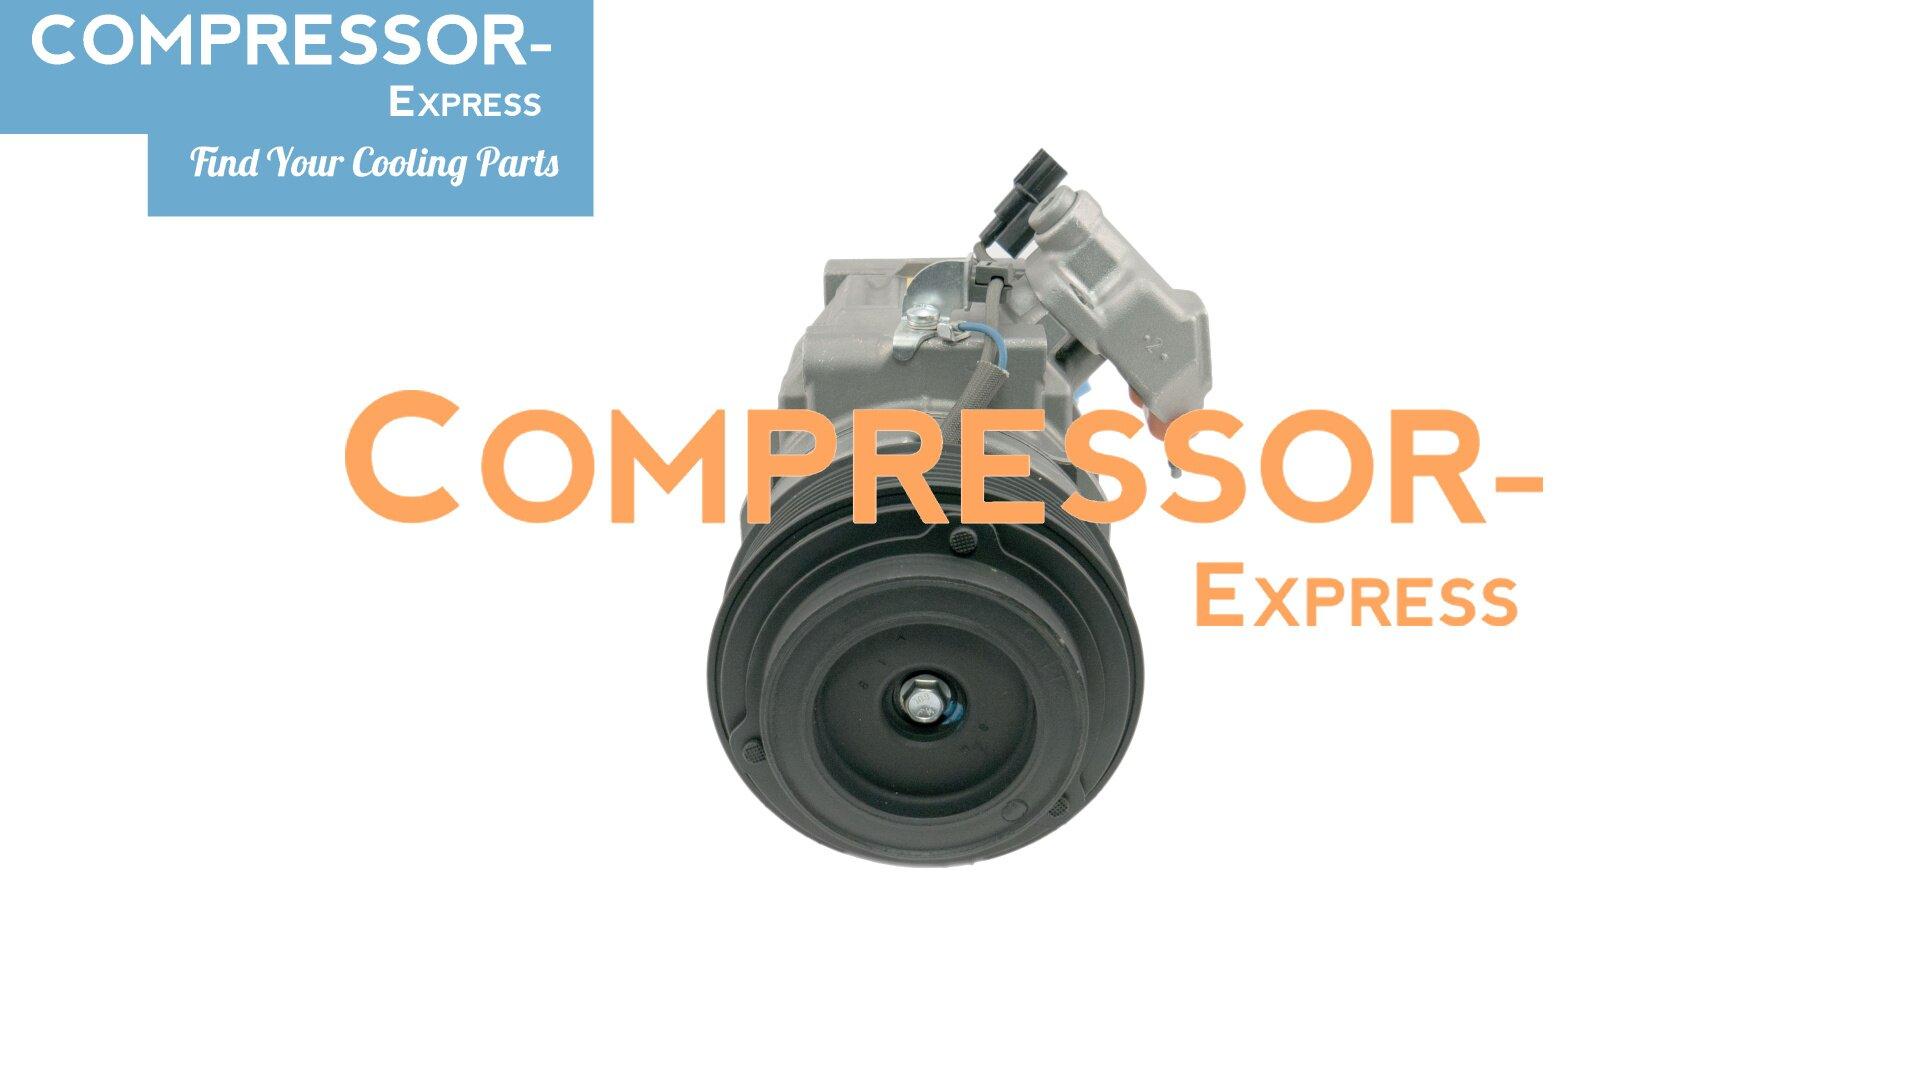 Honda Accord Viii 08 15 Ac Compressor 38810 Rl0 G01 447280 0390 Kompresor All New Jazz Ori 50 10sr15c Pv7